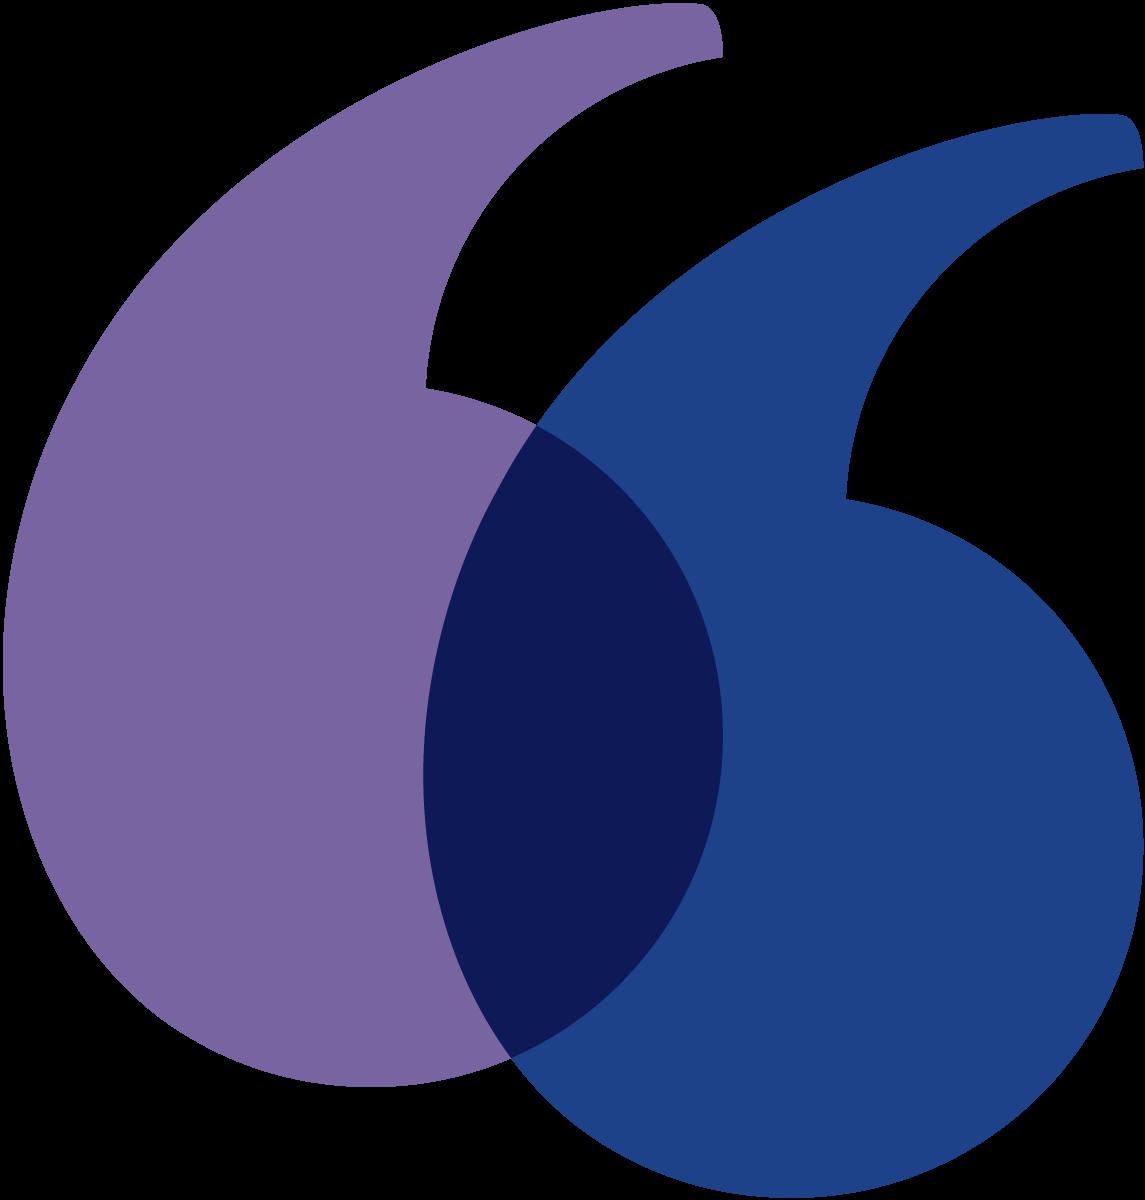 communitywisdom engagement software solution quotation marks   CommunityWisdom